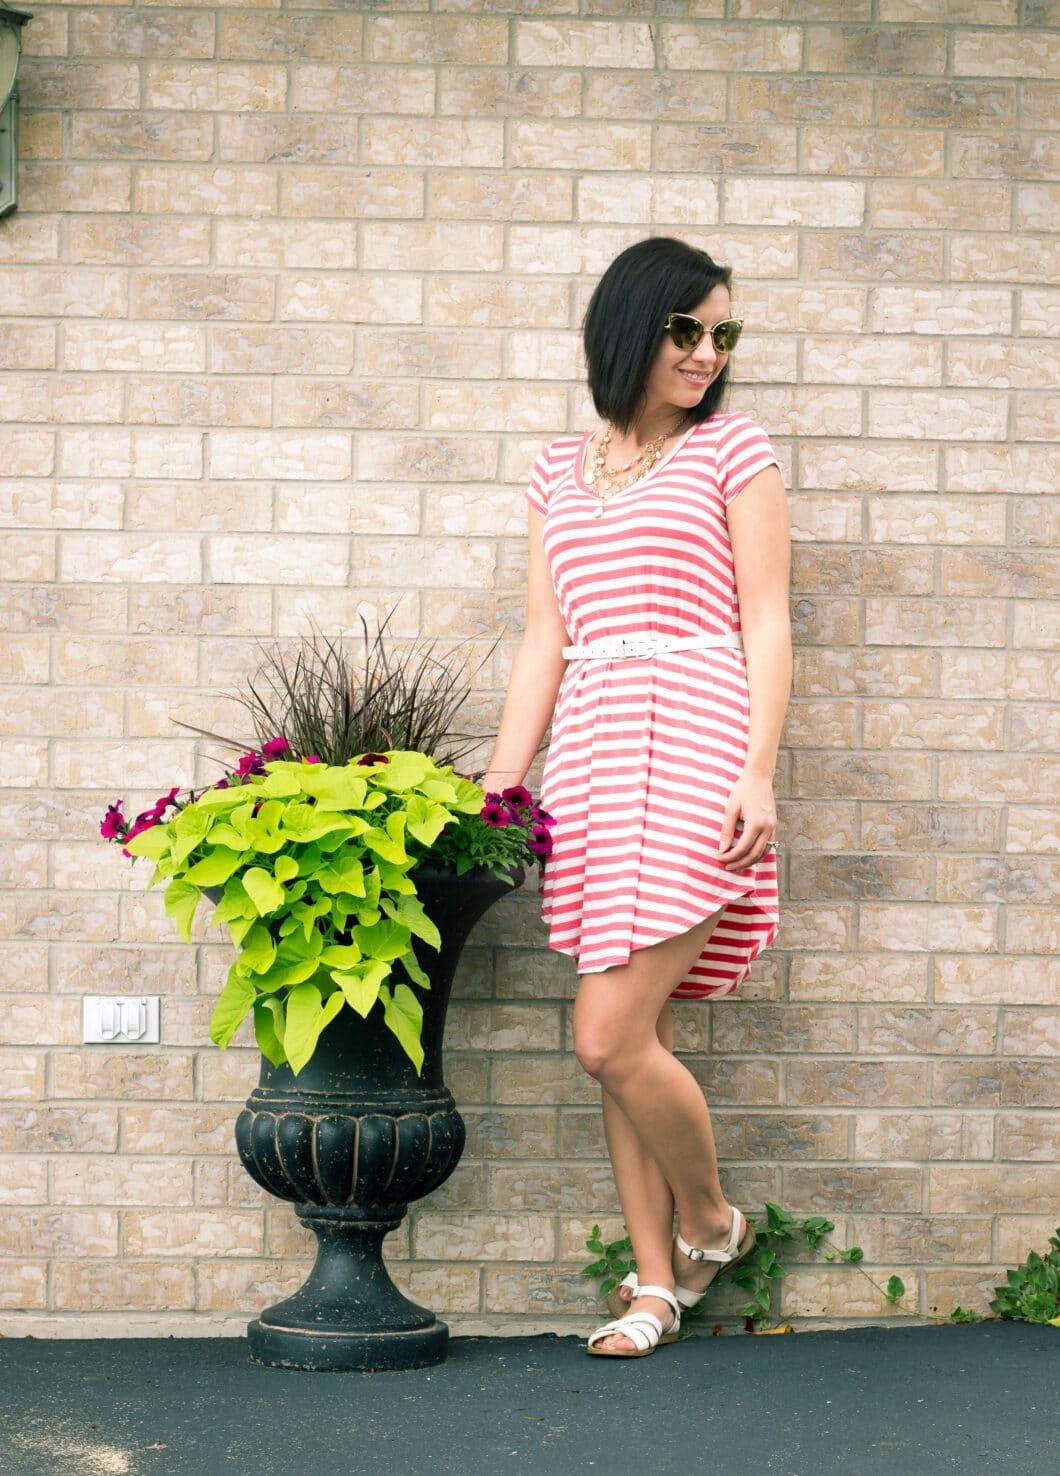 Wisconsin-based Fashion Boutique – Eleanora Grace